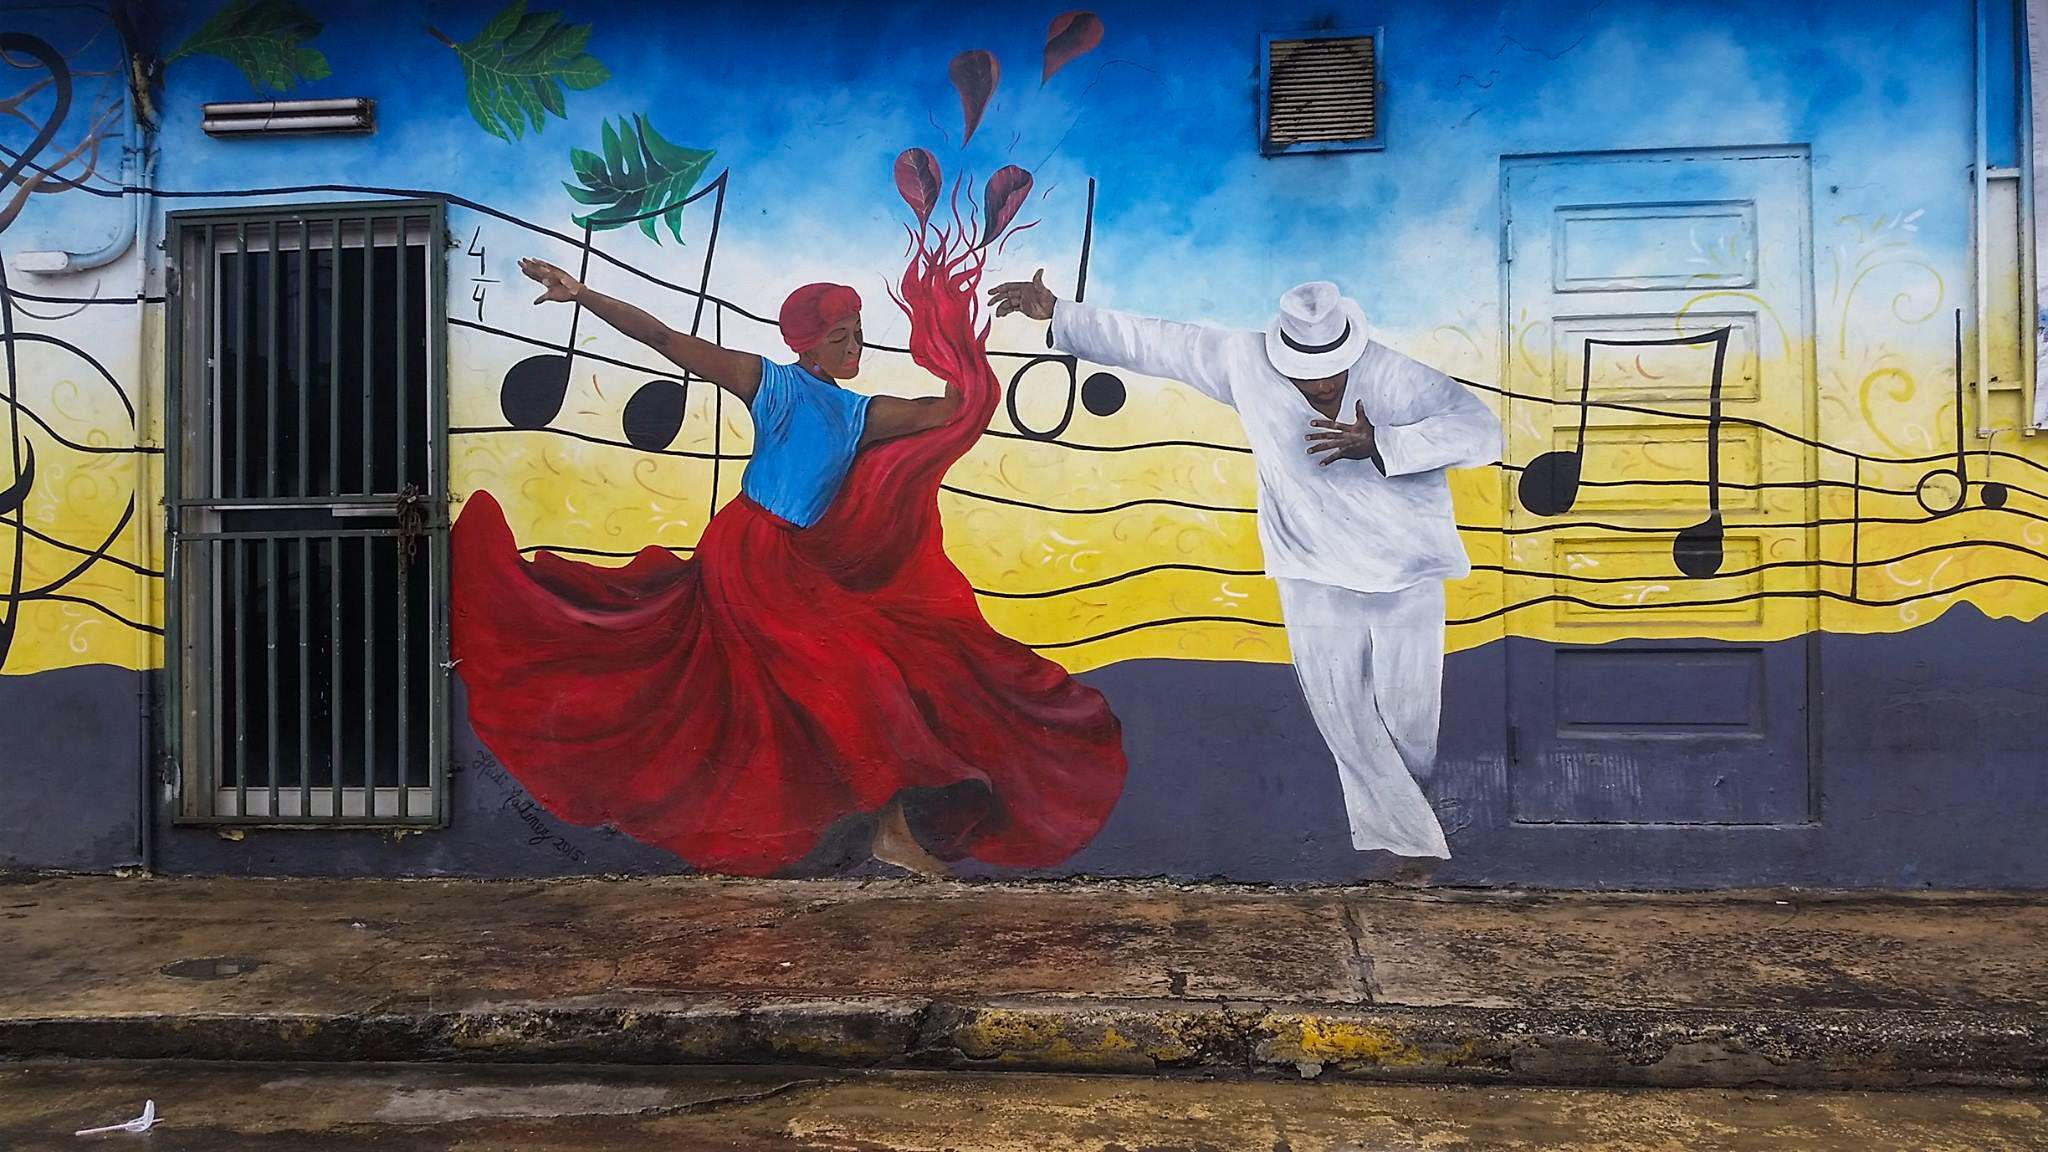 street art in luquillo puerto rico graffiti art simple on simply wall street id=67158